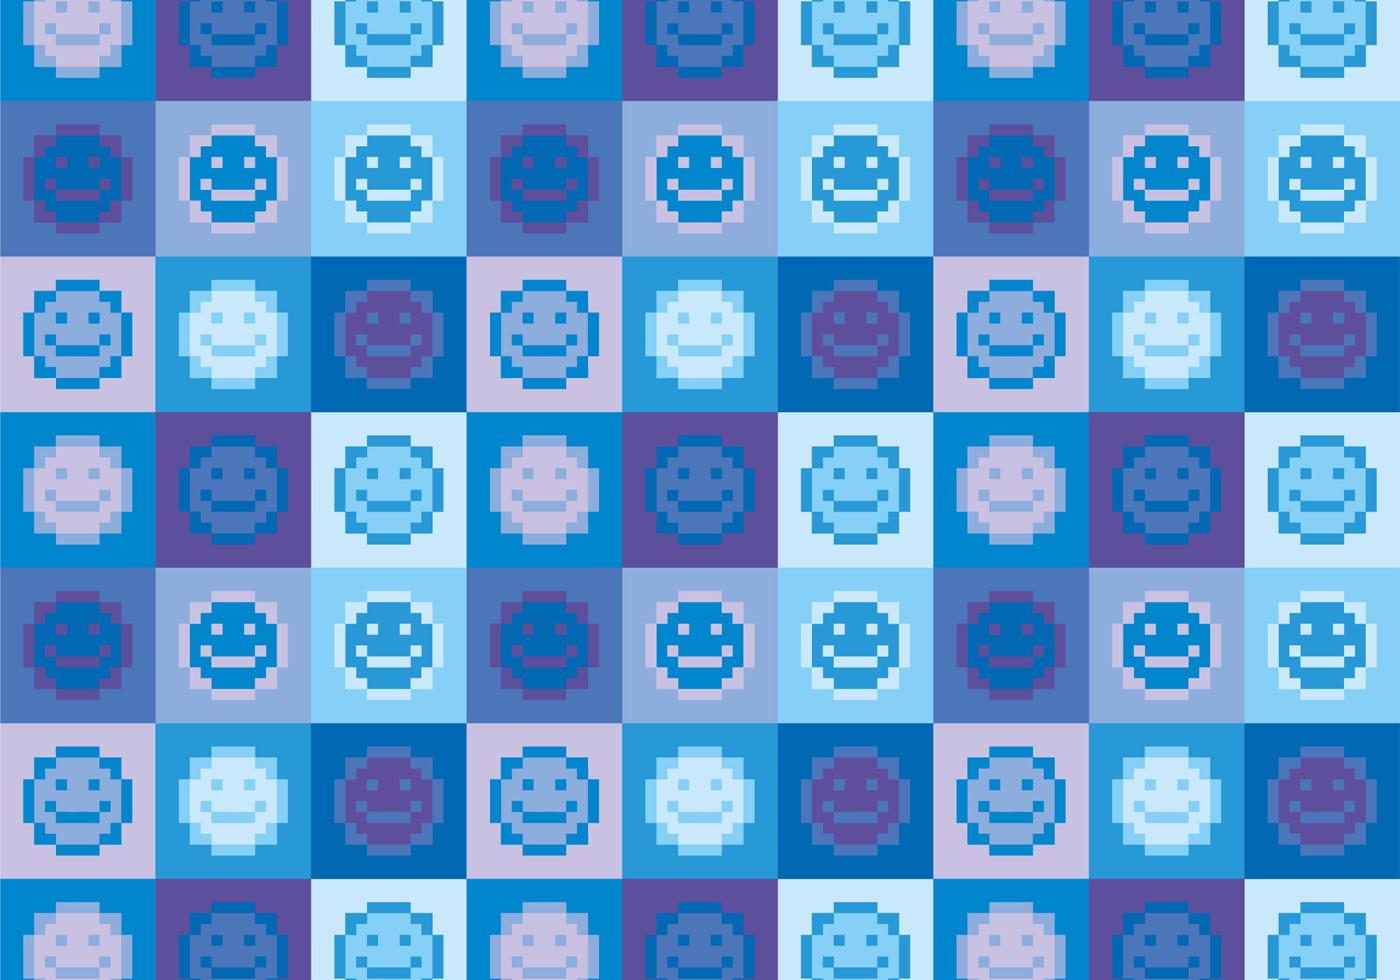 emoji patterns free vector art